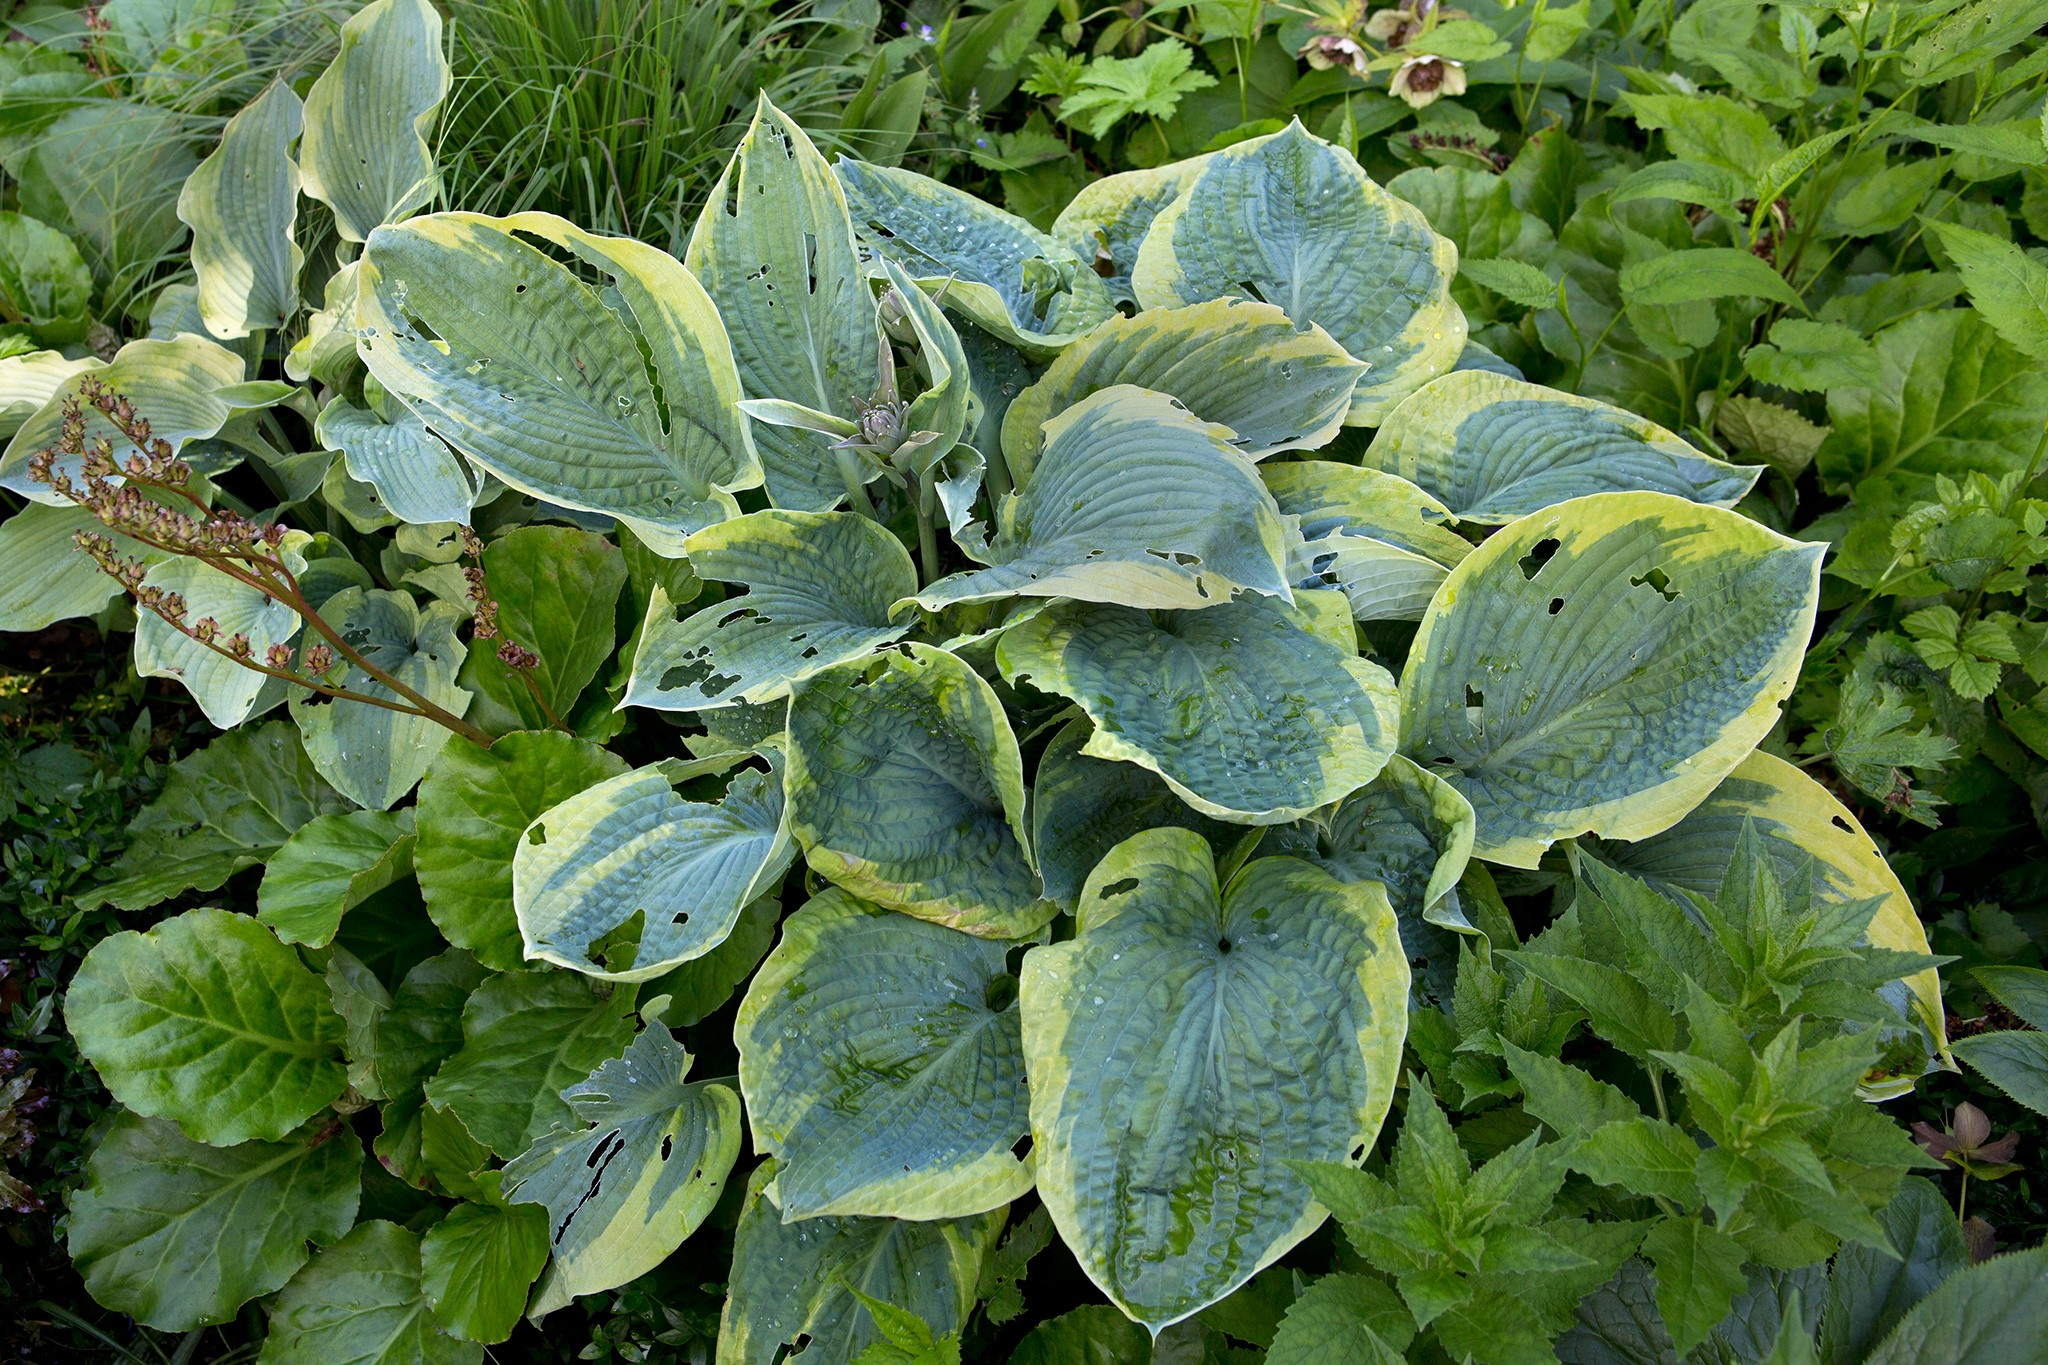 Hosta leaves with slug and snail damage